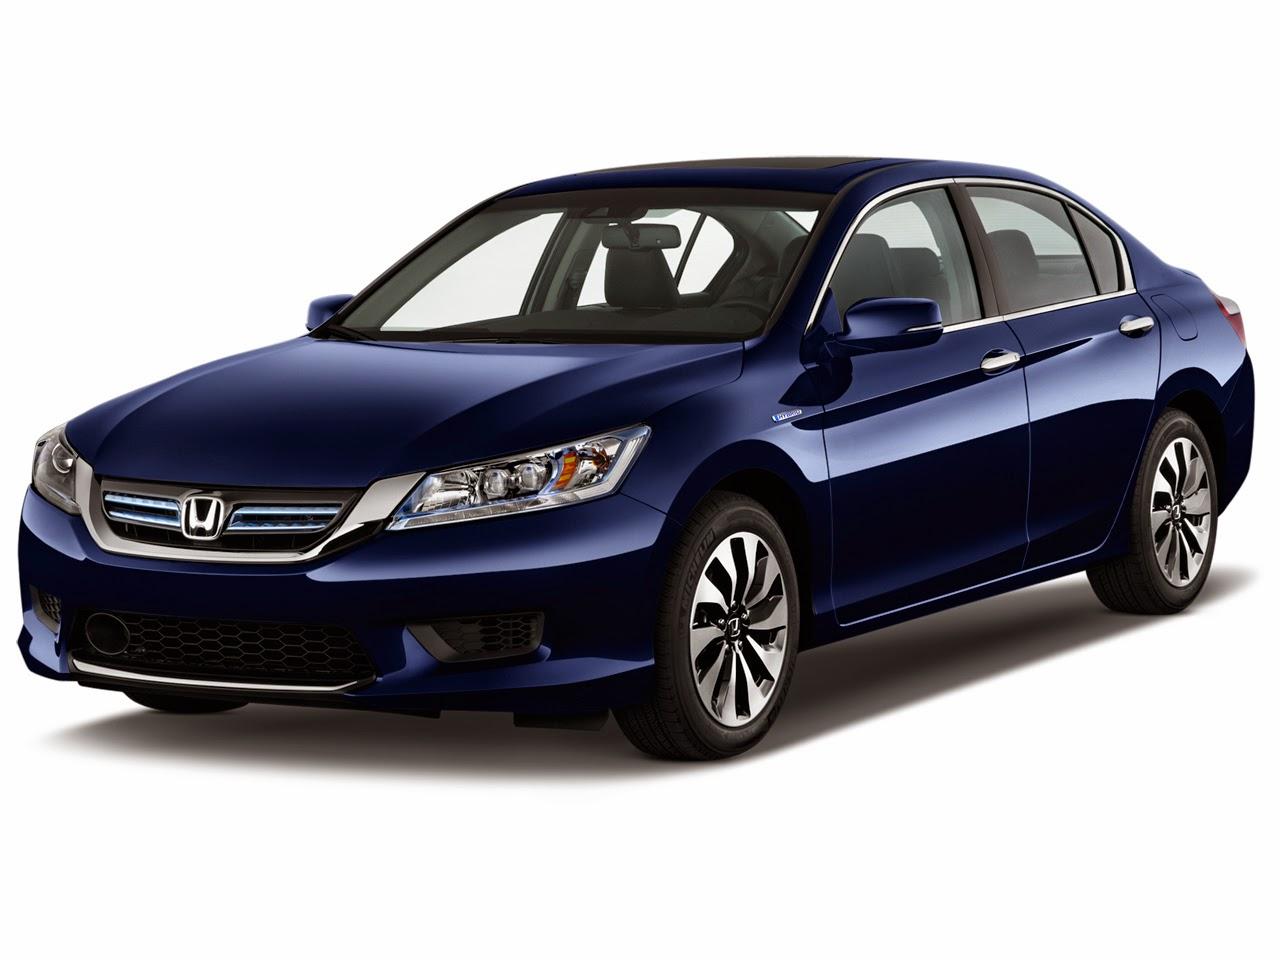 Honda accord hybrid 2015 car wallpaper car wallpaper hd for Honda hybrid vehicles